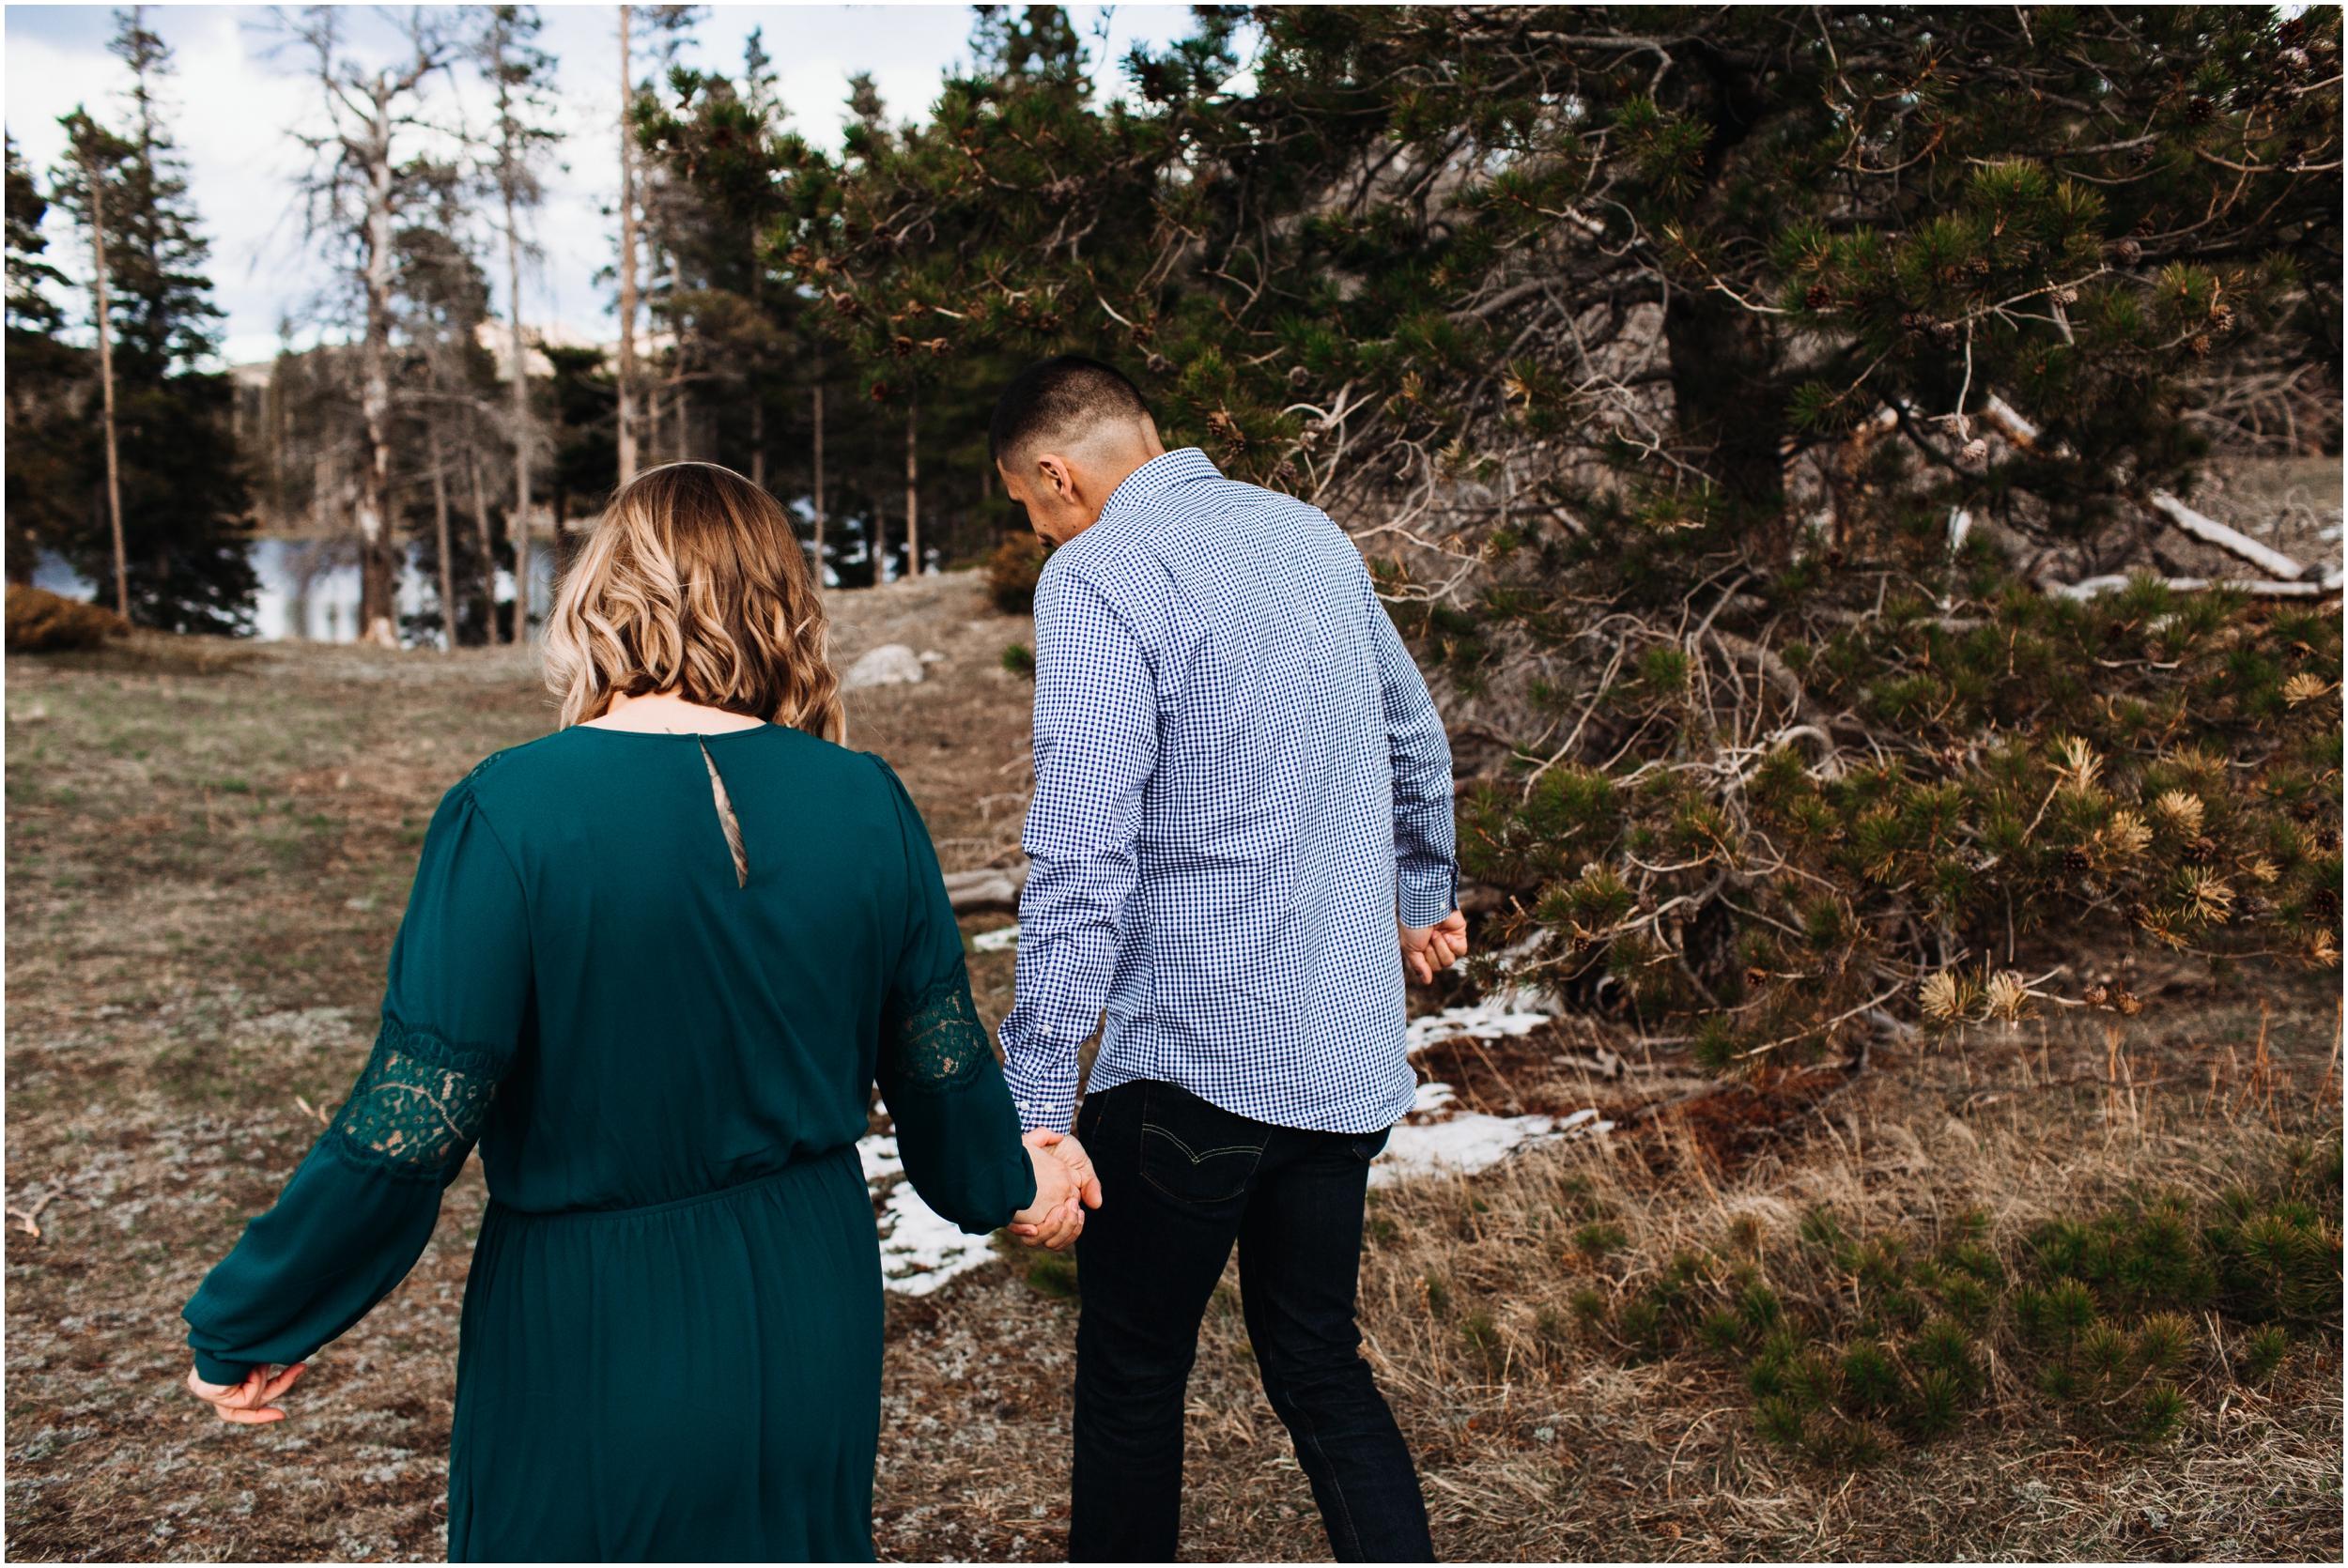 rocky-mountain-national-park-elopement-sprague-lake-colorado-adventure-wedding-photographer_taylor-powers_147.jpg